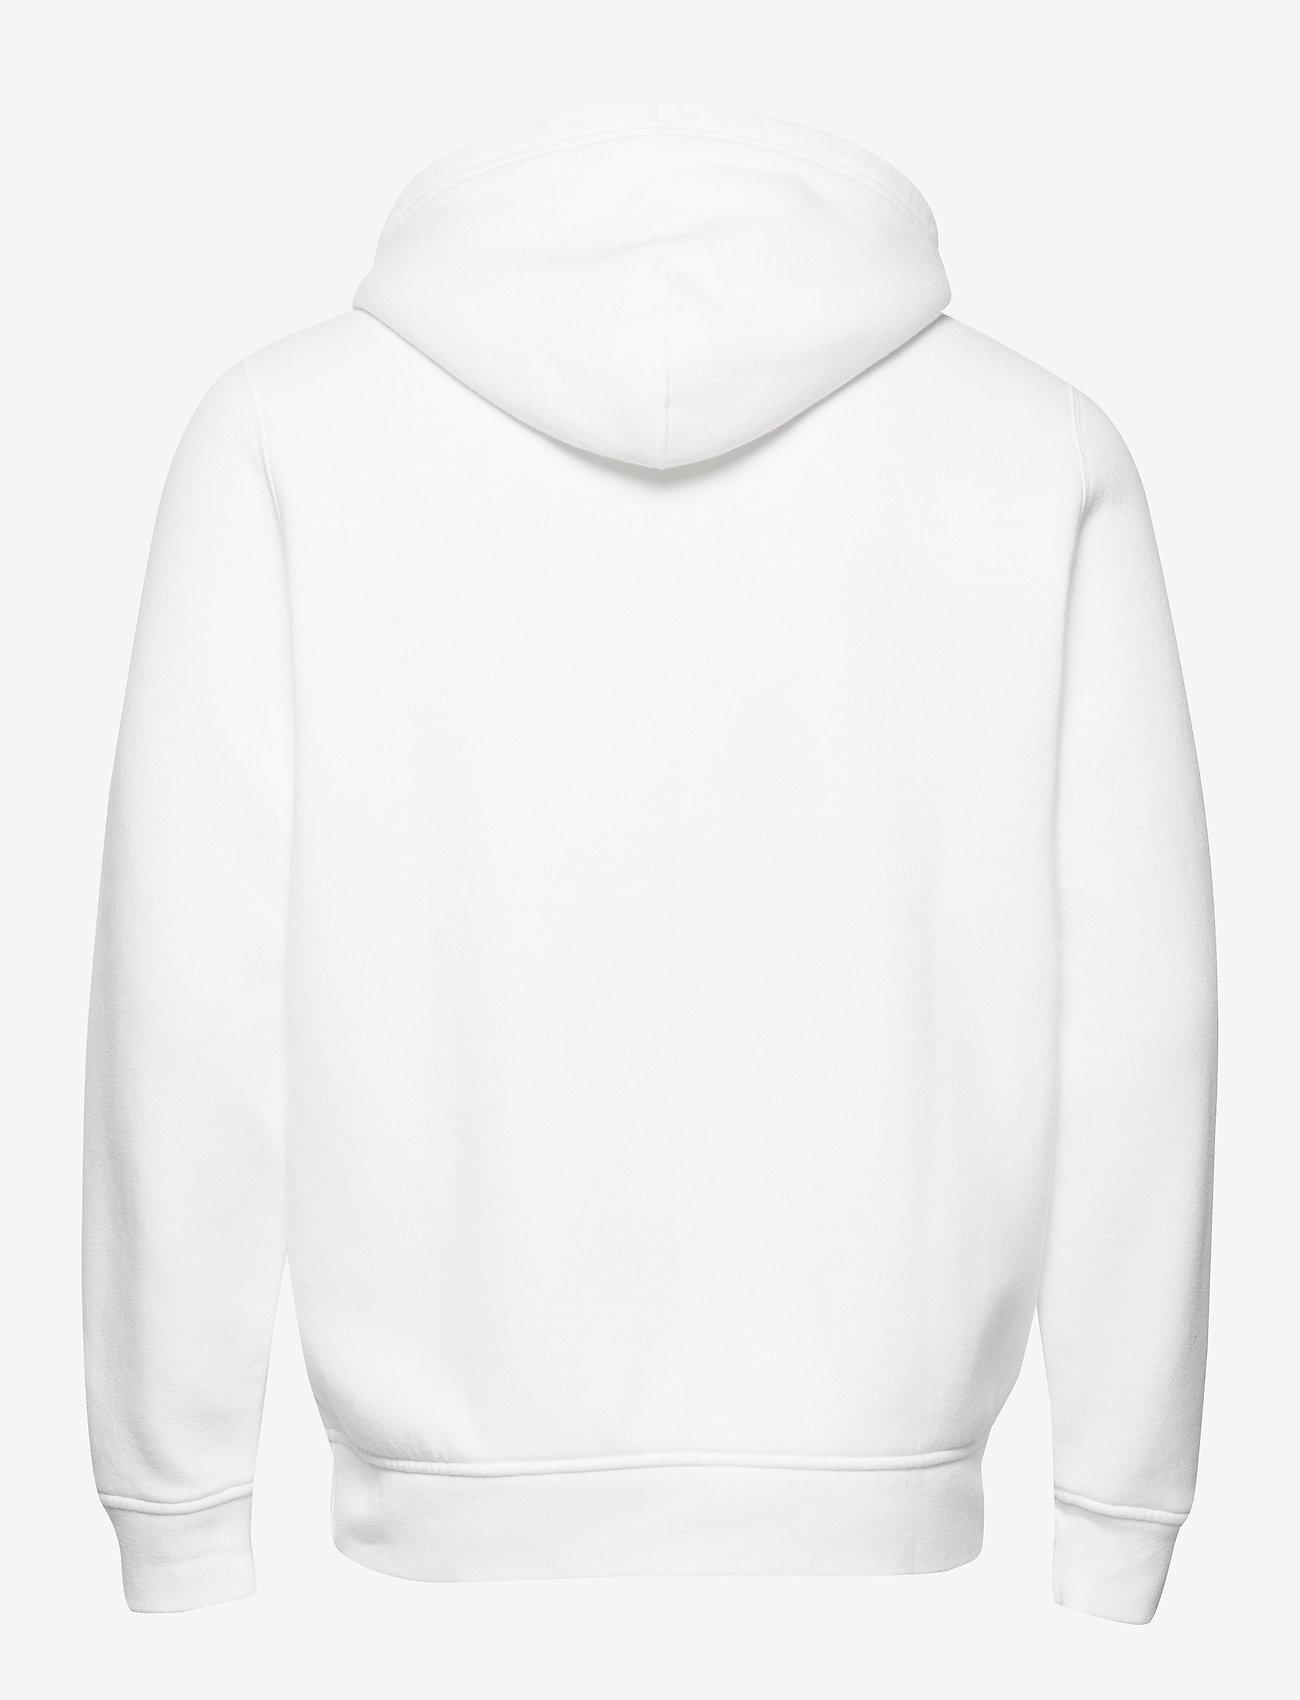 Abercrombie & Fitch Icon Popover - Sweatshirts White